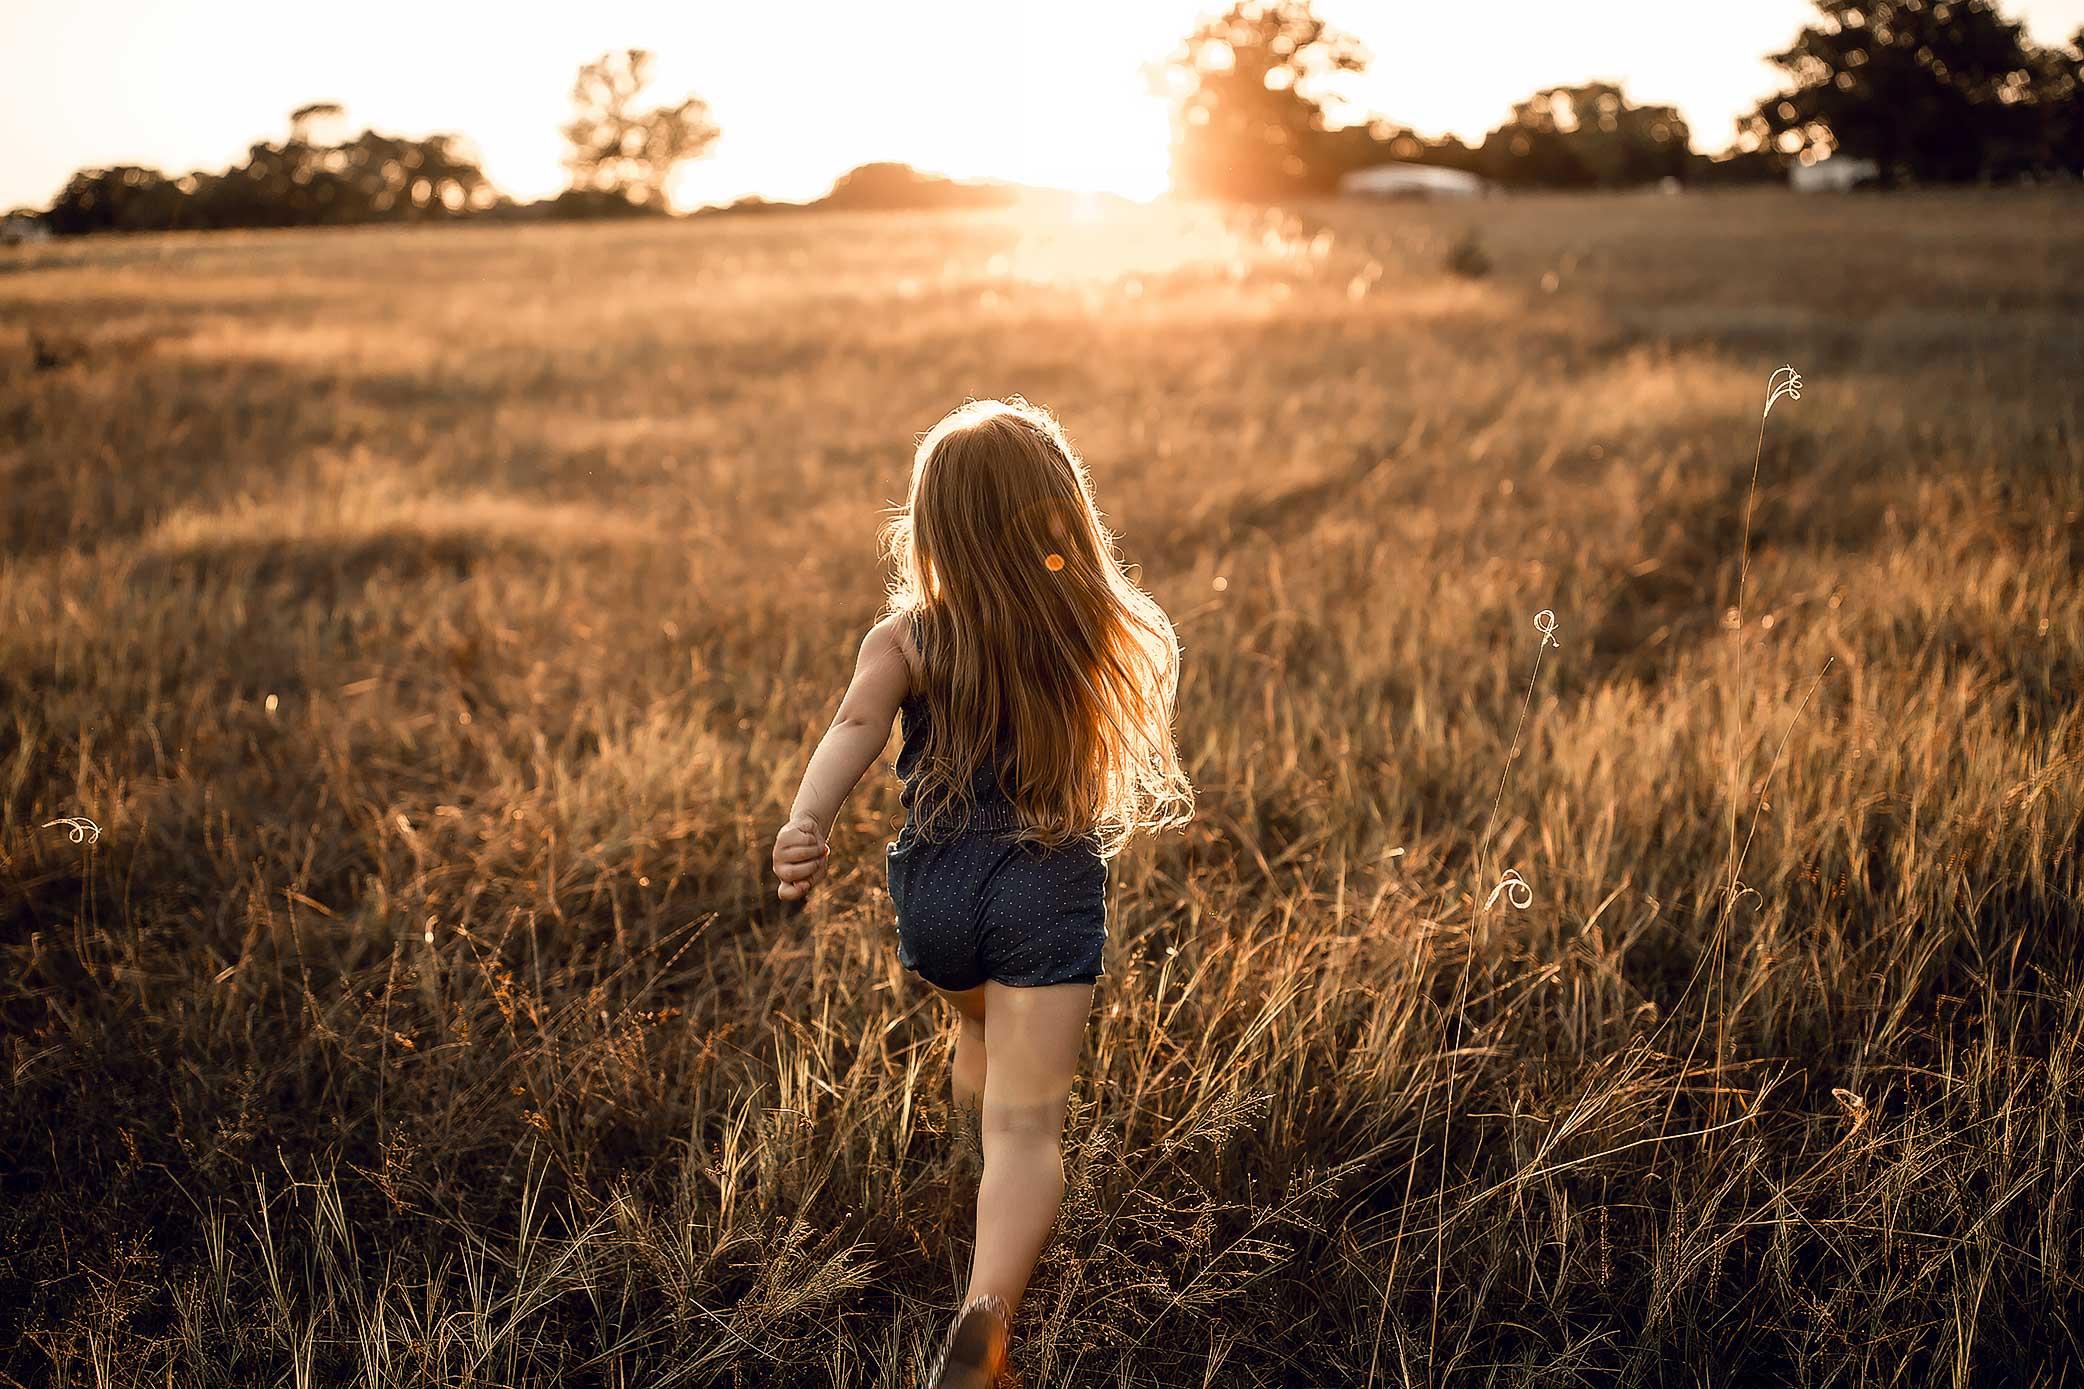 shelby-schiller-photography-child-running-into-the-summer-sunset.jpg